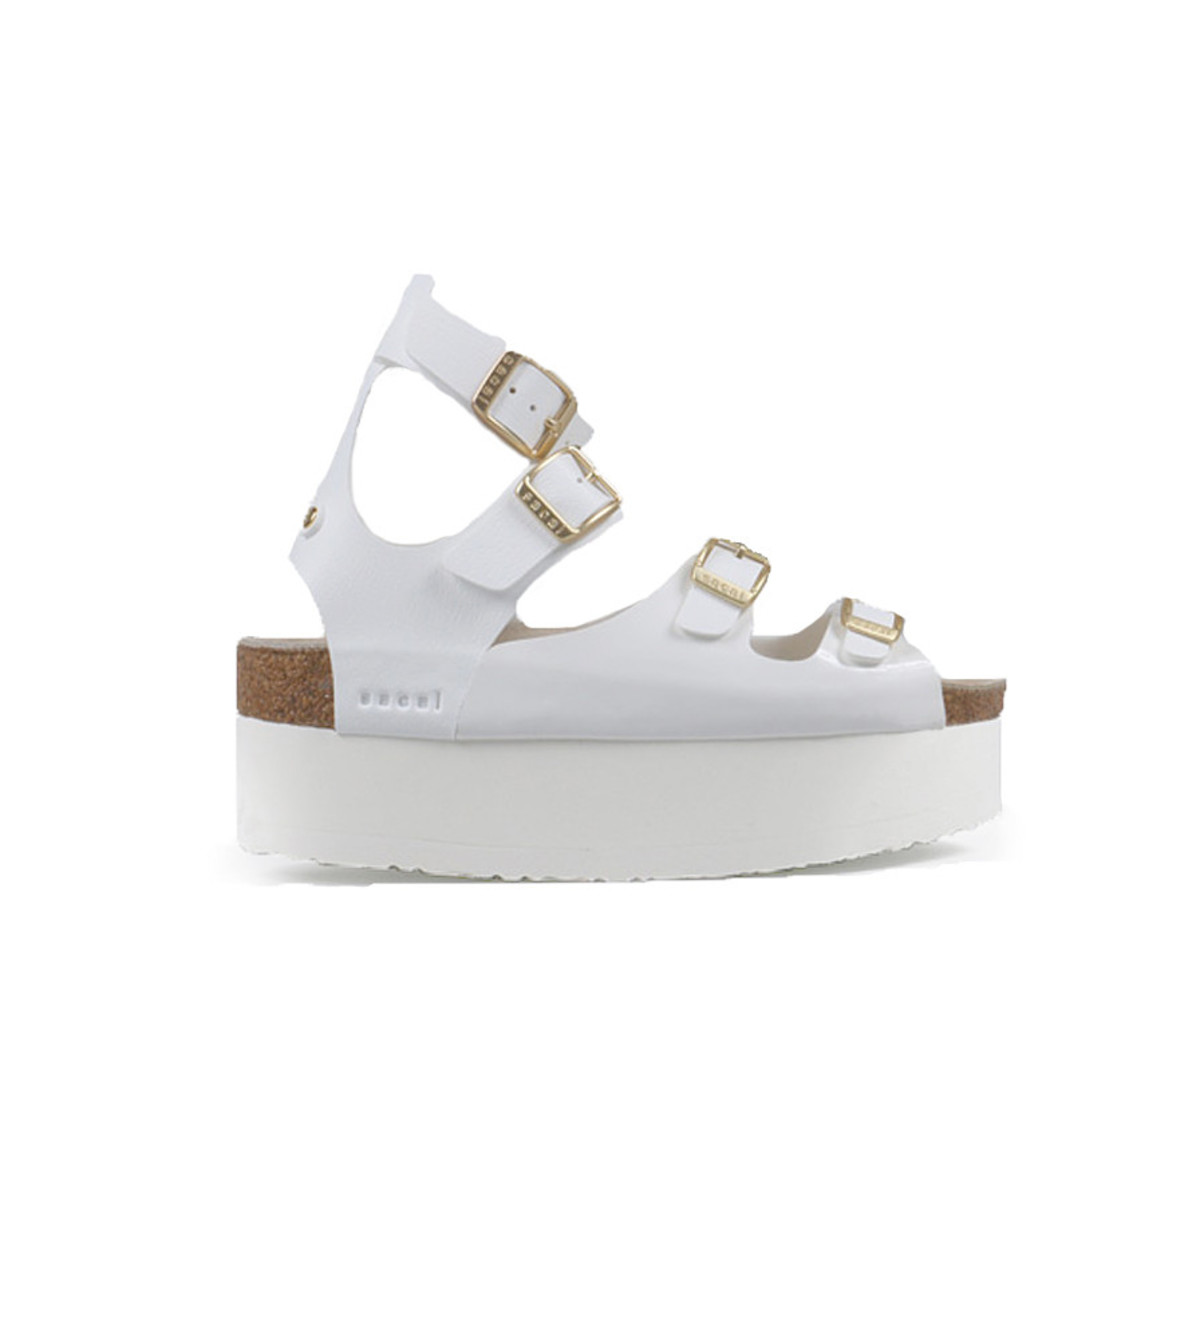 35655df189a Sacai Luck Leather Multi-Strap Platform Sandals